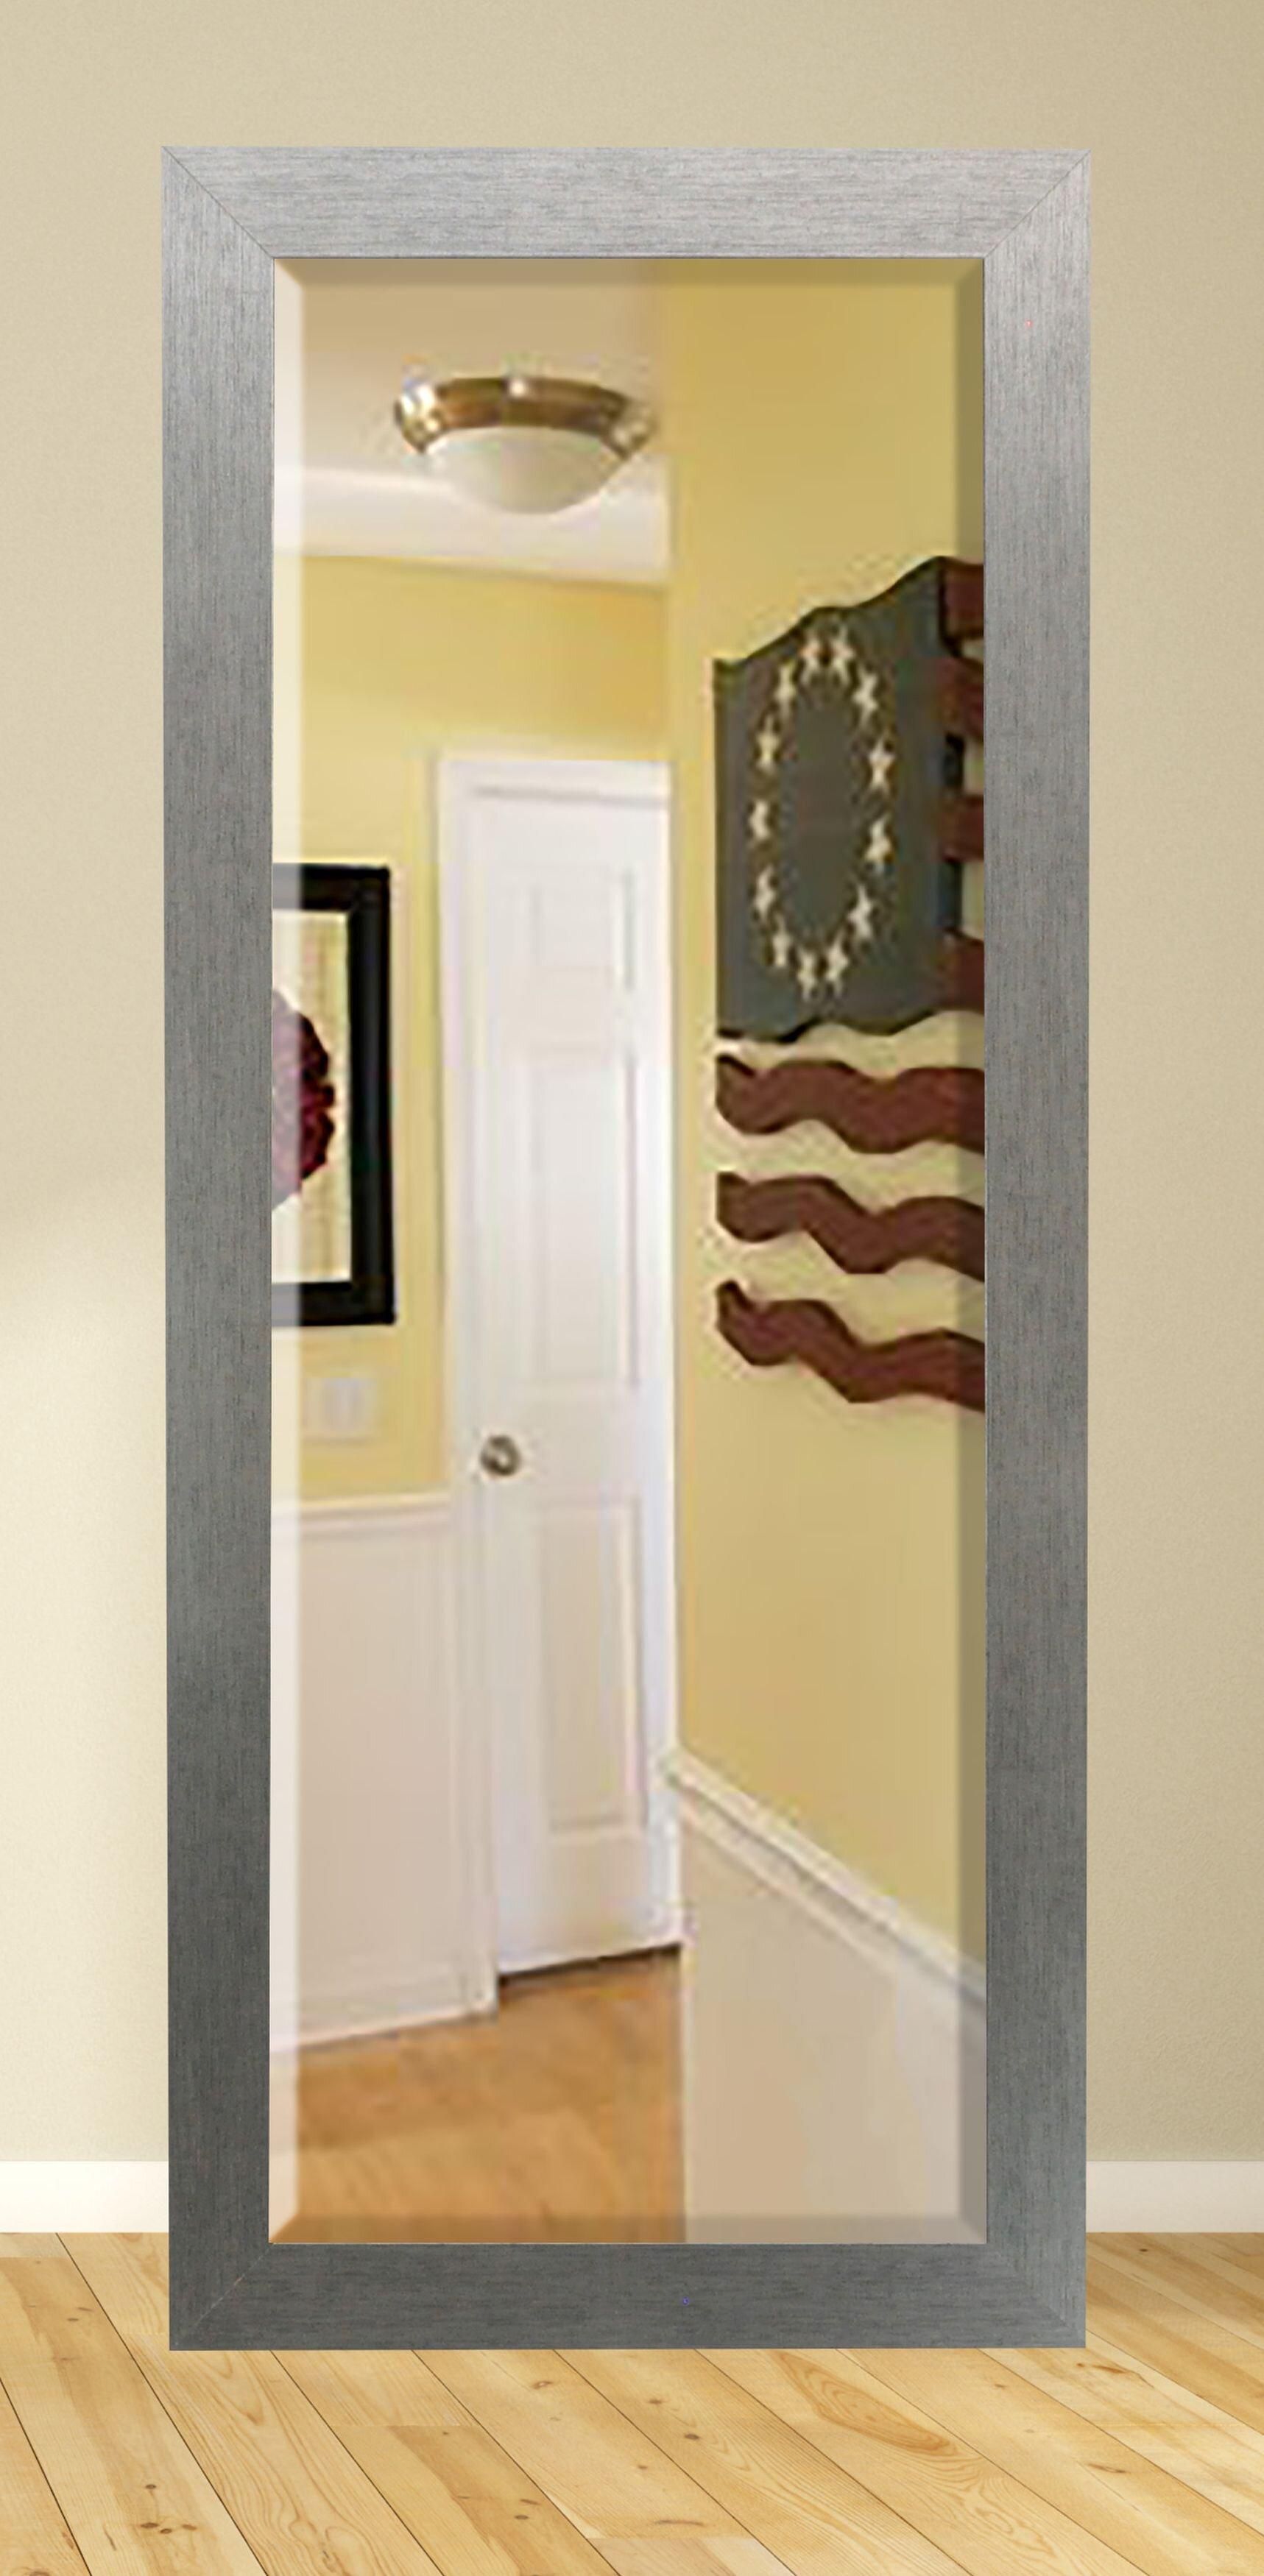 Fantastic Decorative Full Length Wall Mirror Gallery - Art & Wall ...